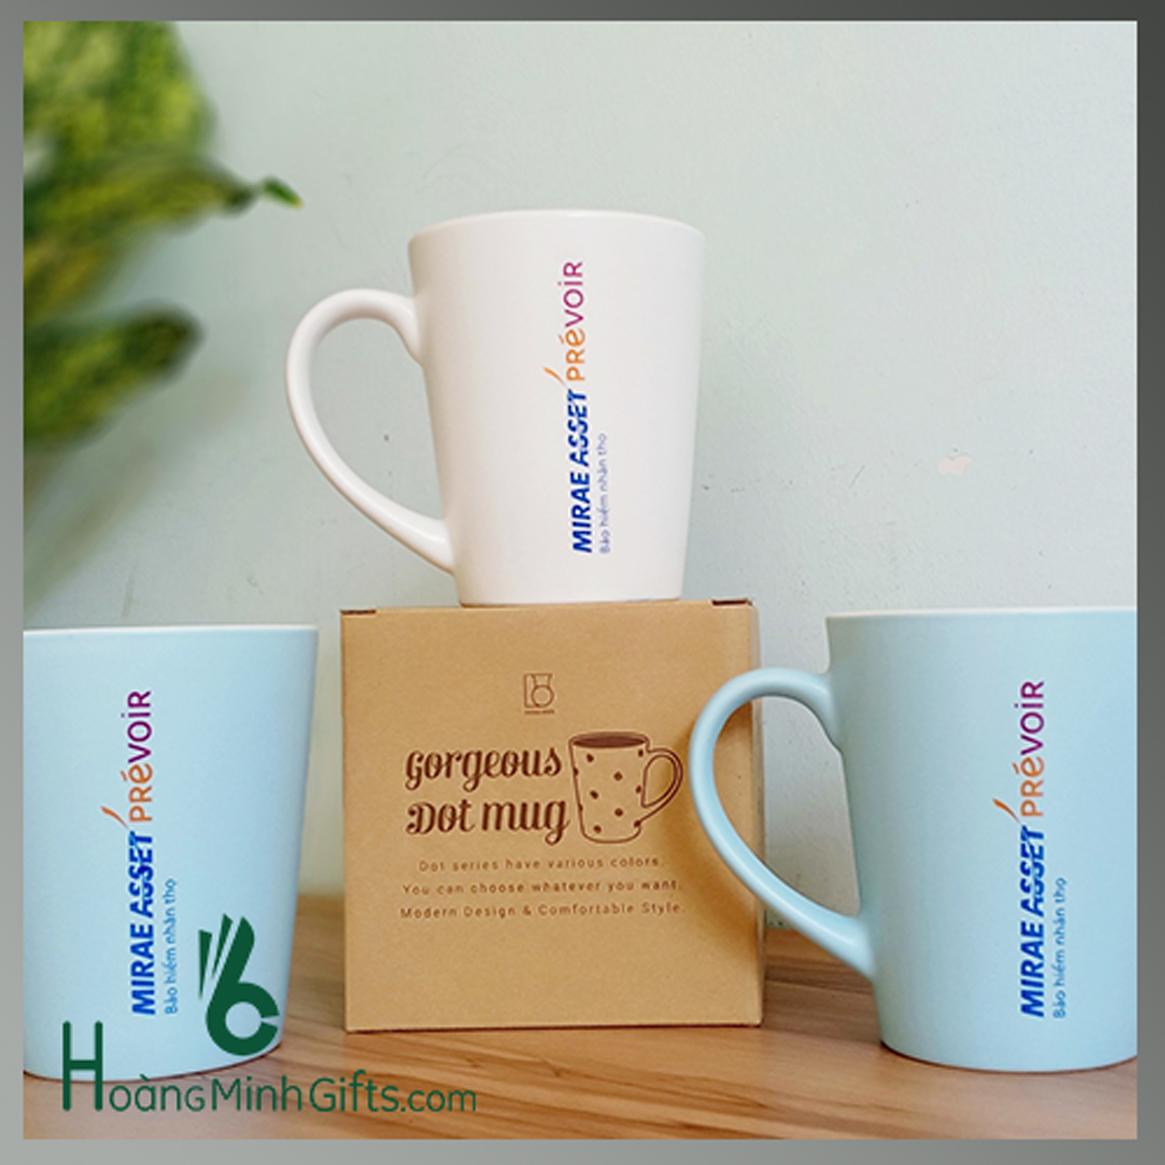 coc-su-han-quoc-pastel-mug-kh-bhnt-mirae-asset-prevoir